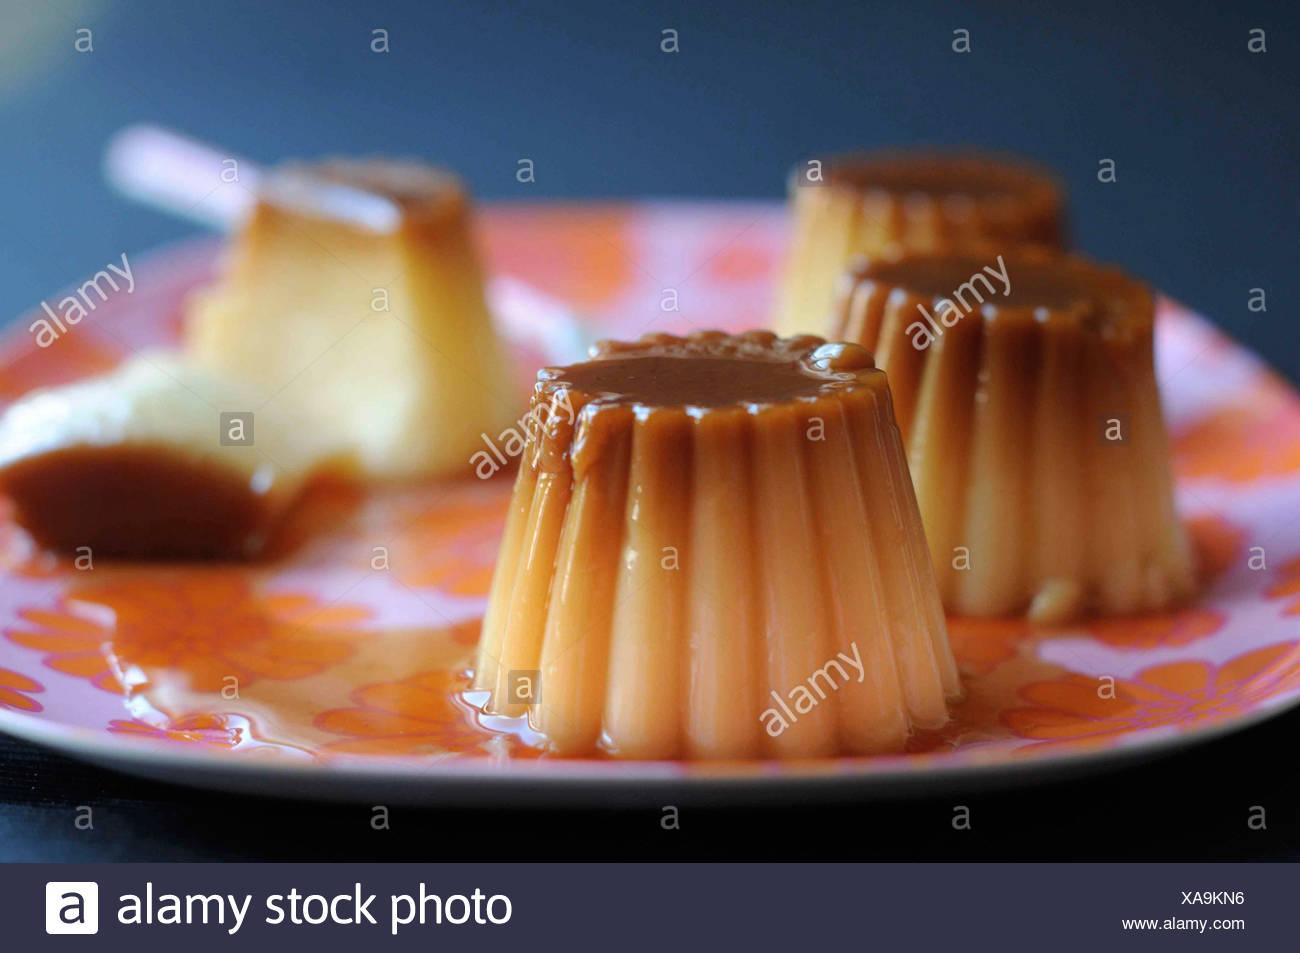 Cream Caramel on a flowery tray - Stock Image